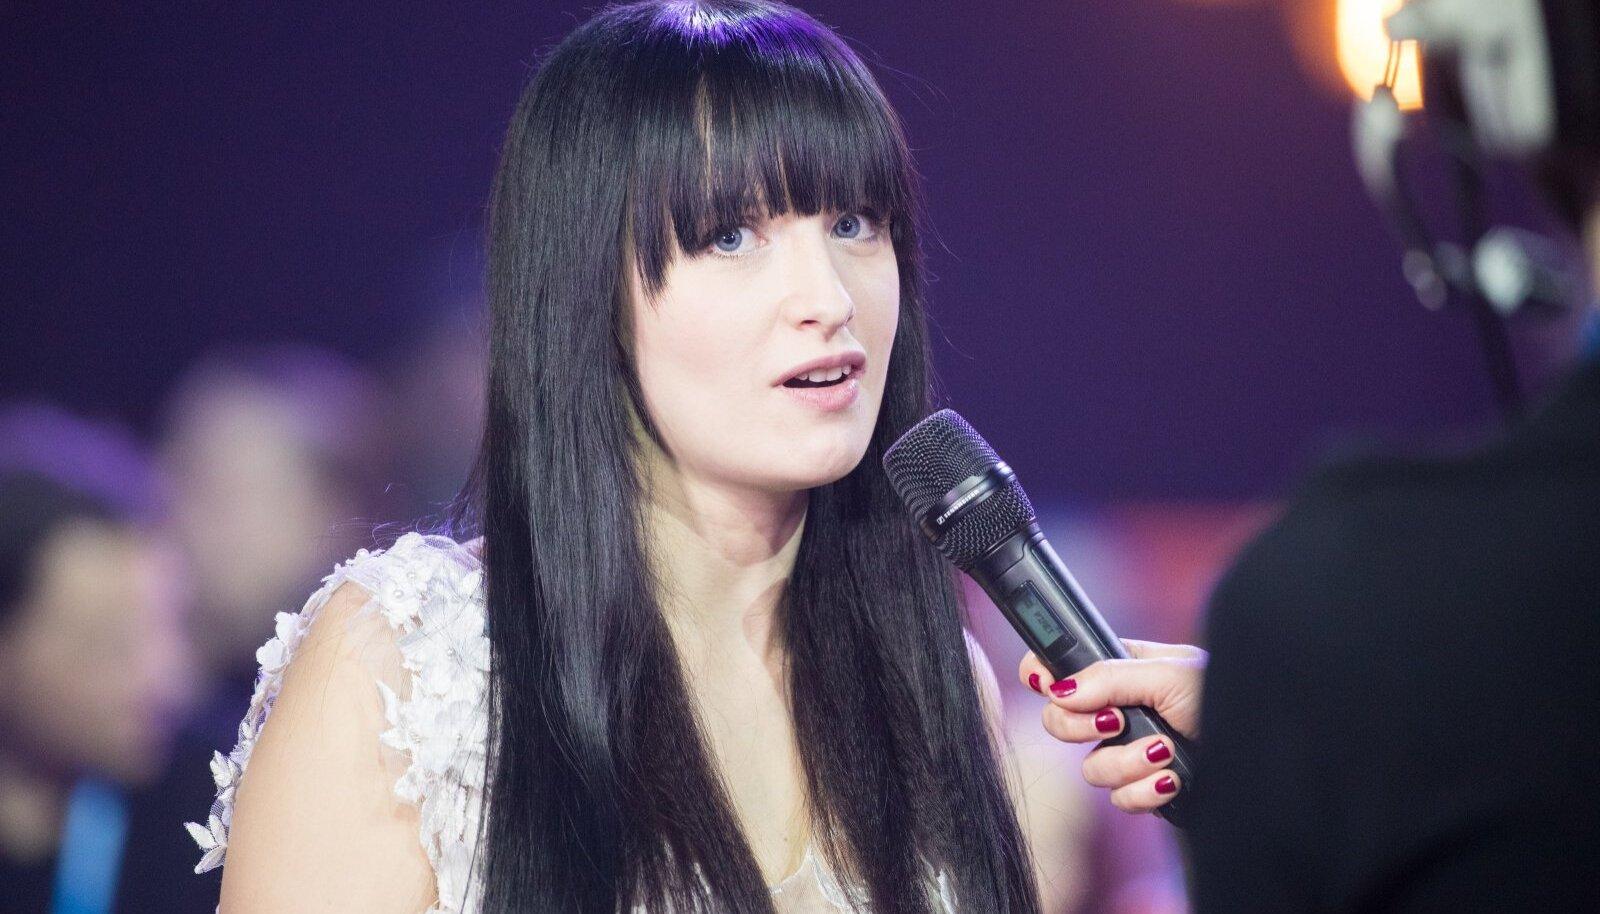 Sandra Nurmsalu, Eesti Laul 2019